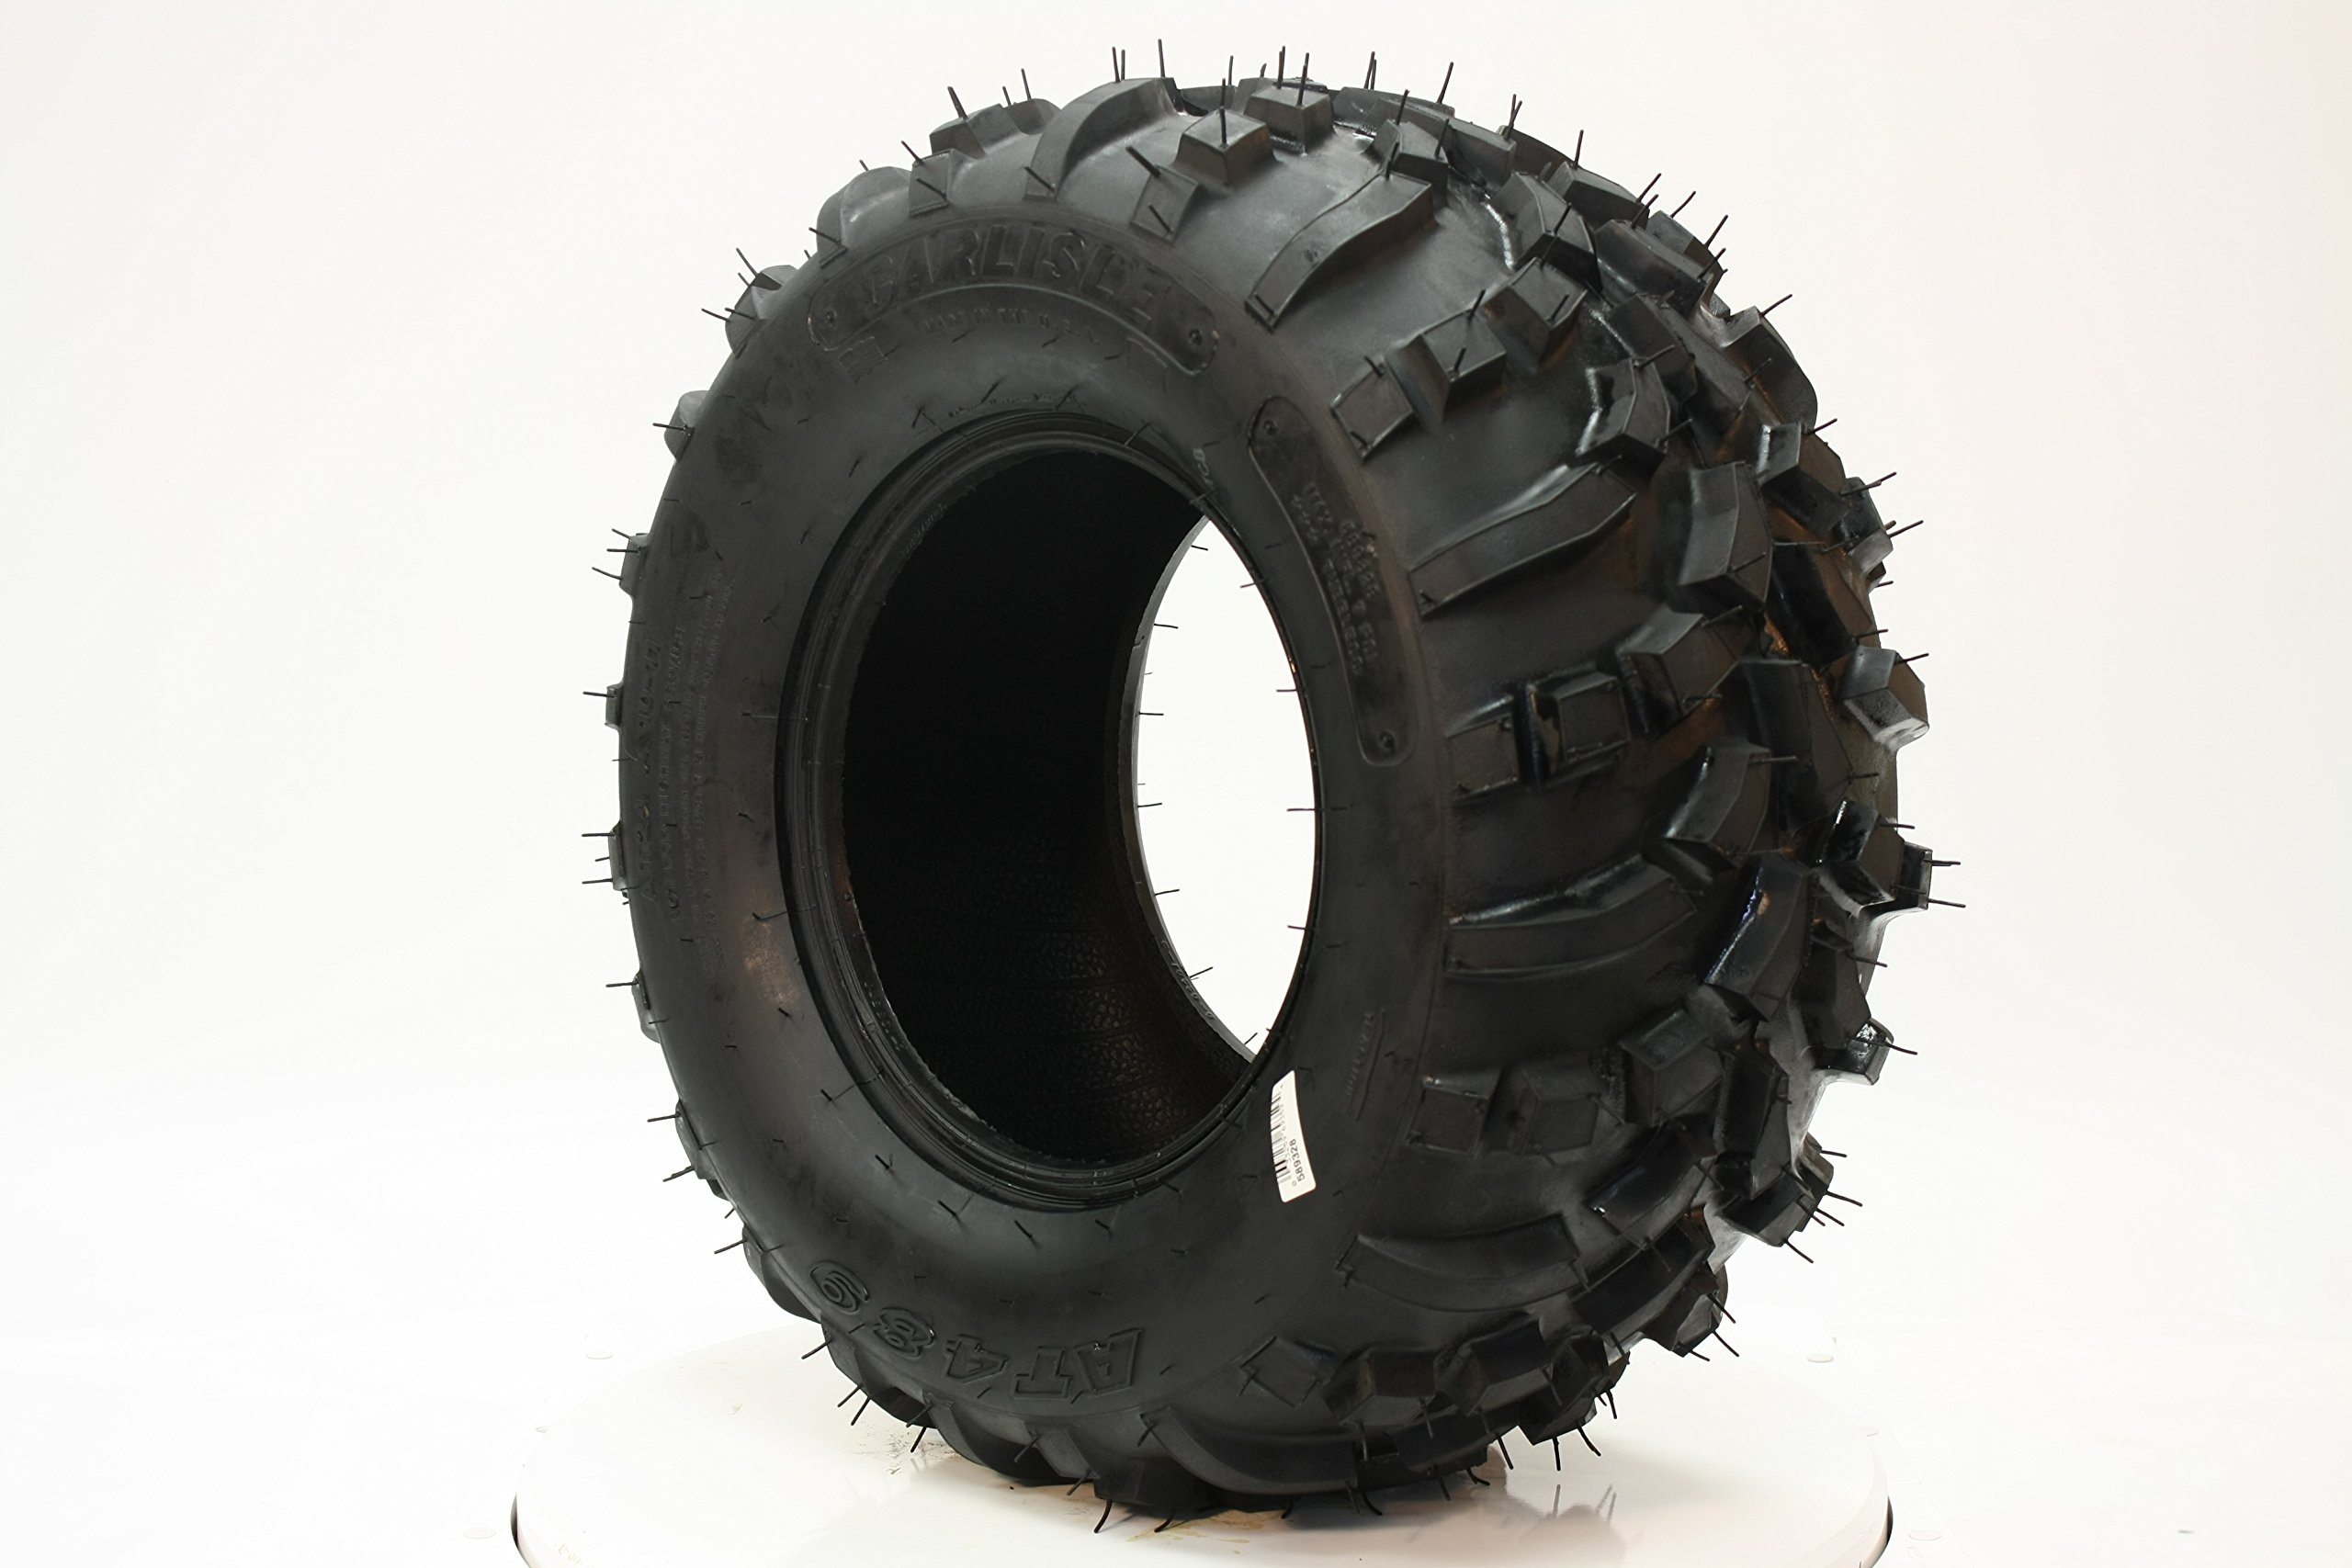 Carlisle AT489 ATV Bias Tire - 22x9.50-10 4